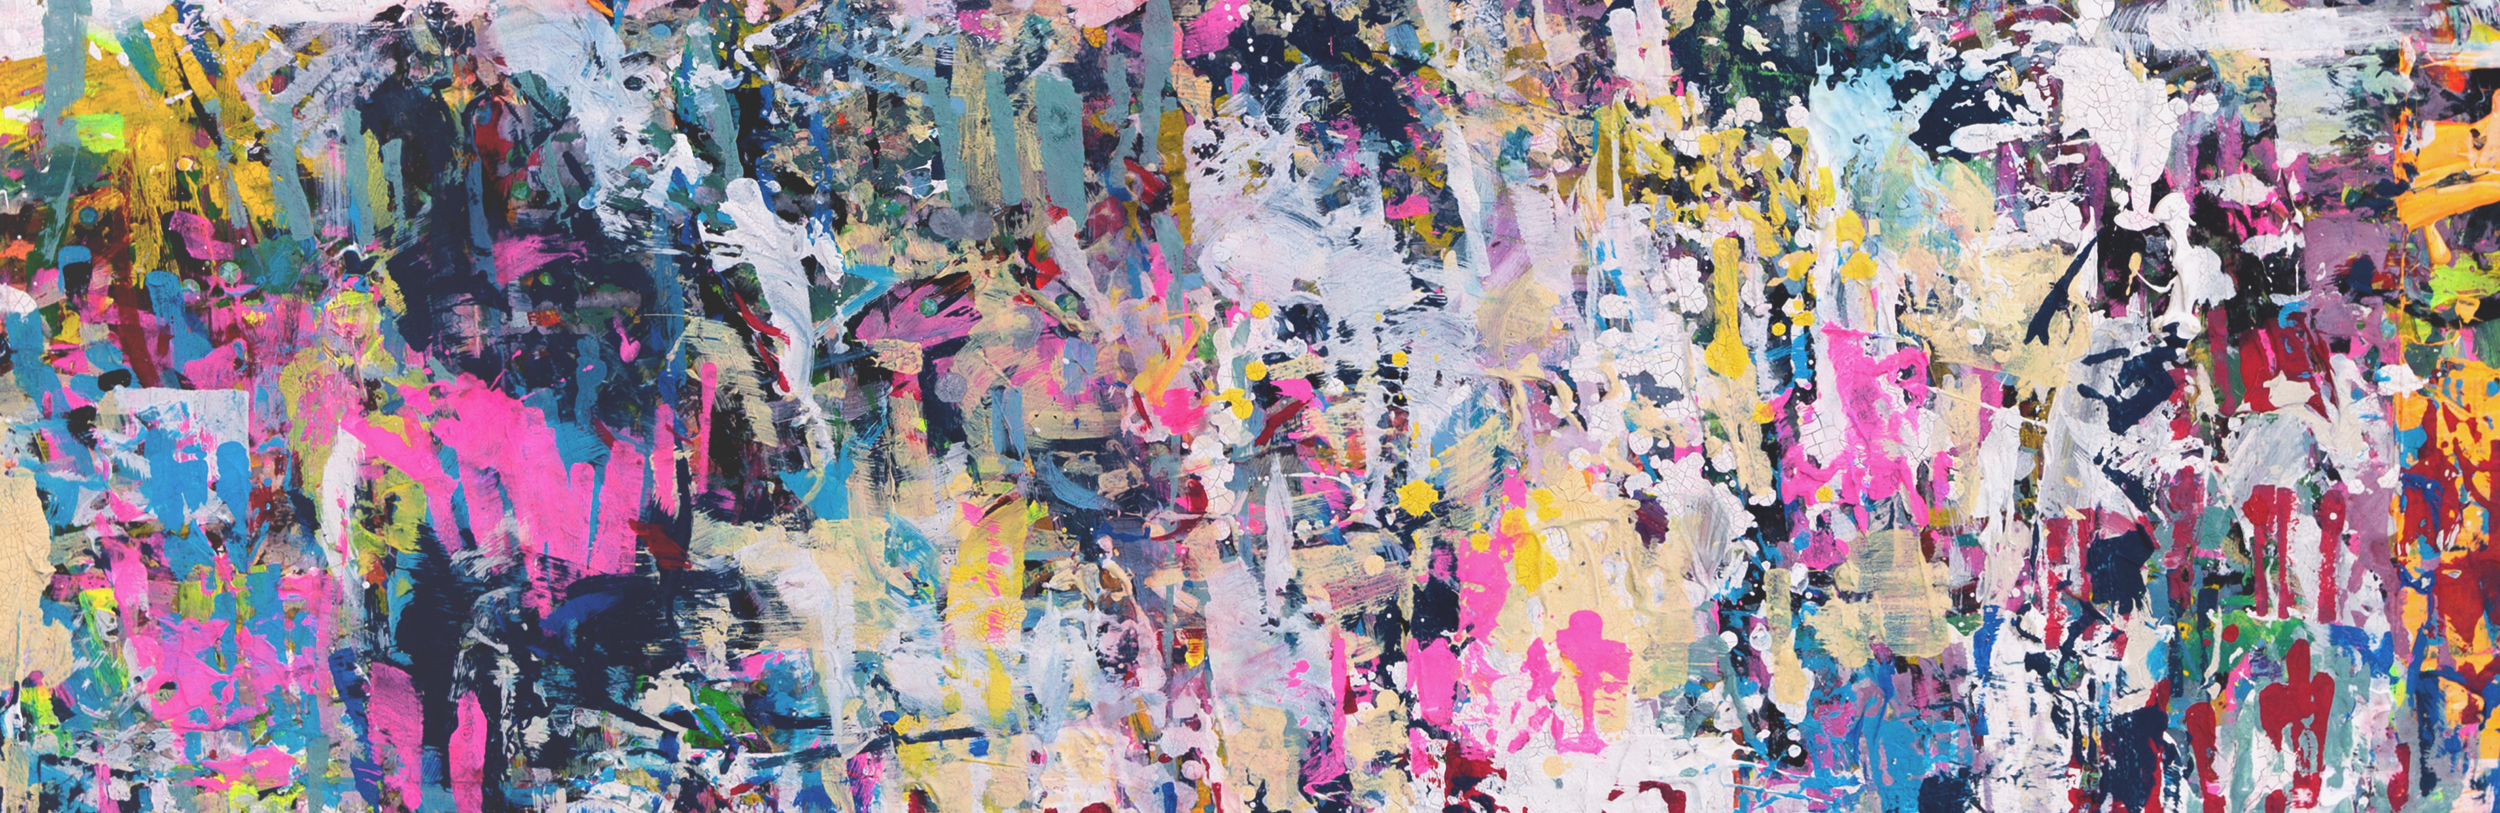 bonjourmolotov+covers+Illustration+Ilustracao+painting+pintura+acrylic+acrílico+canvas+tela+paper+cardboard+mdf+Andre+Gigante+07+N4.jpg